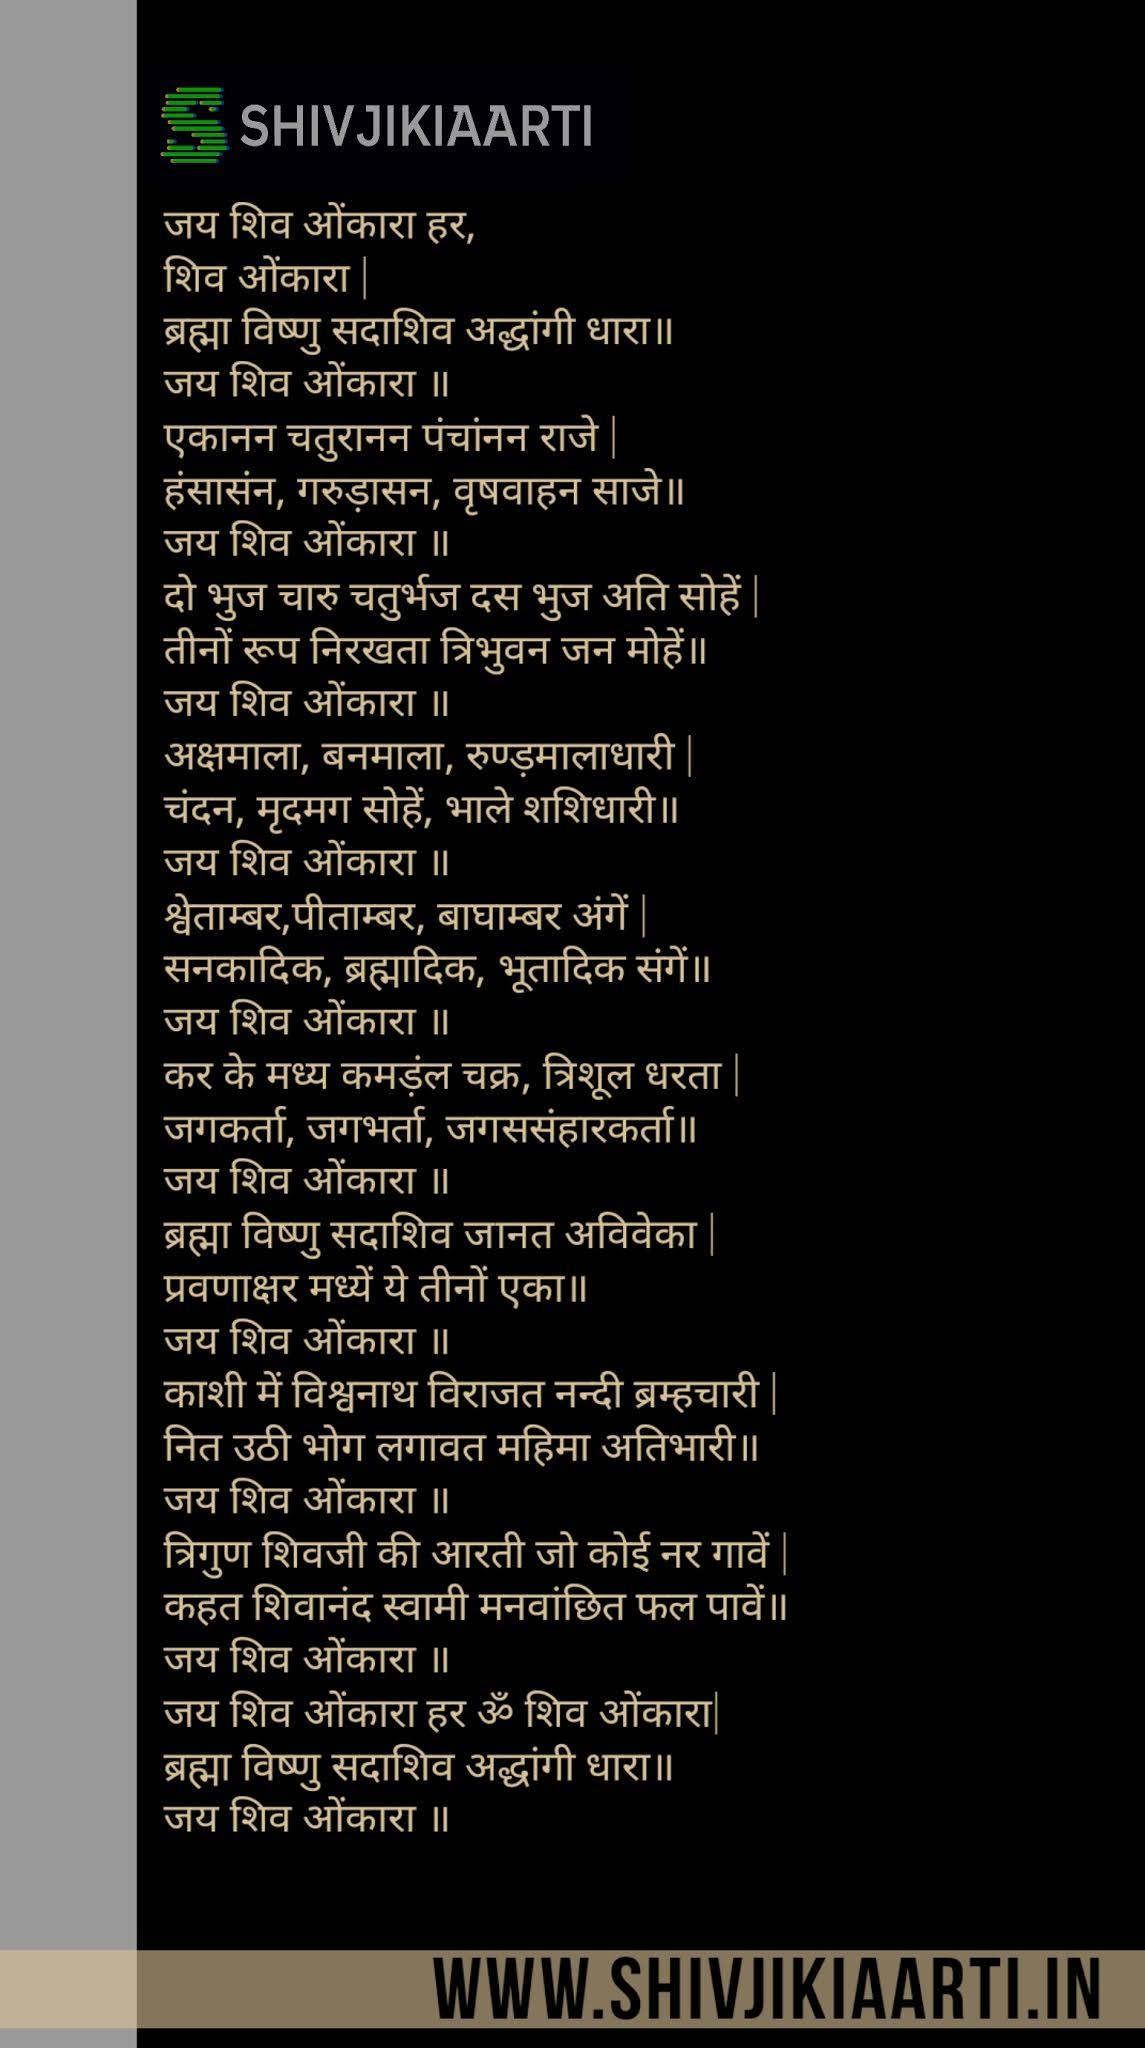 Shivji ki Aarti